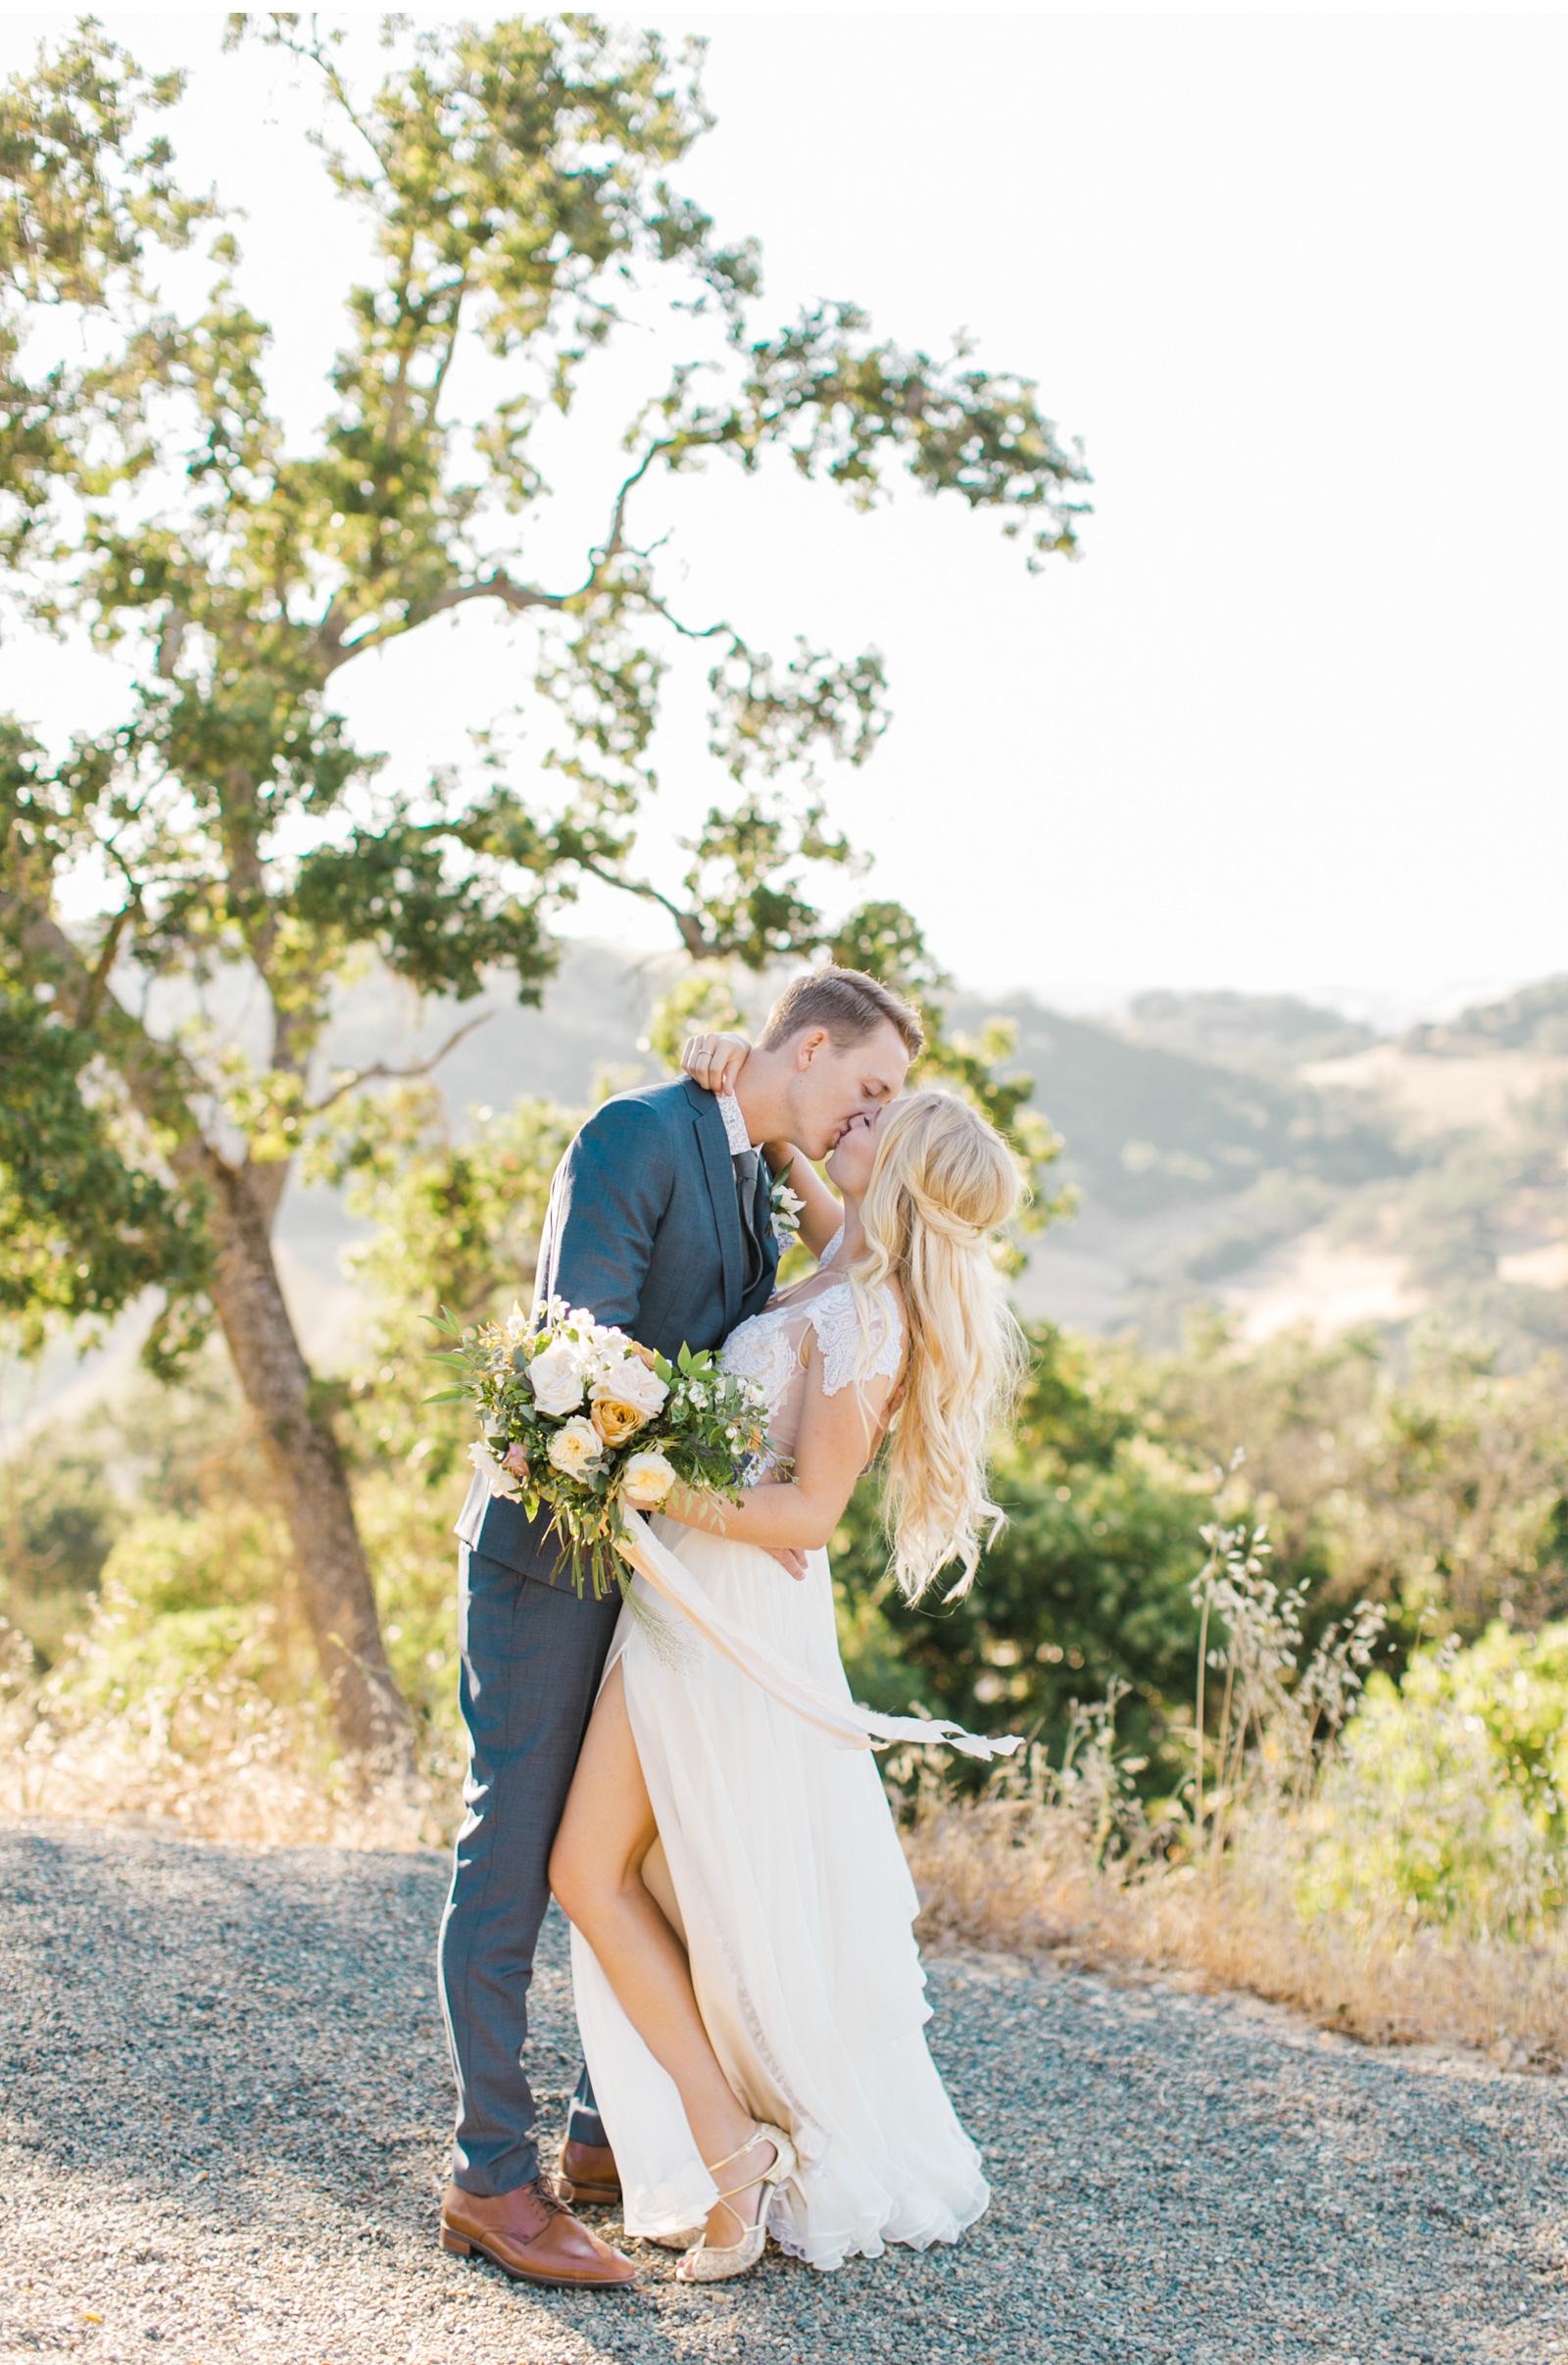 Natalie-Schutt-Photography's-Wedding-Style-Me-Pretty-Paso-Robles_14.jpg